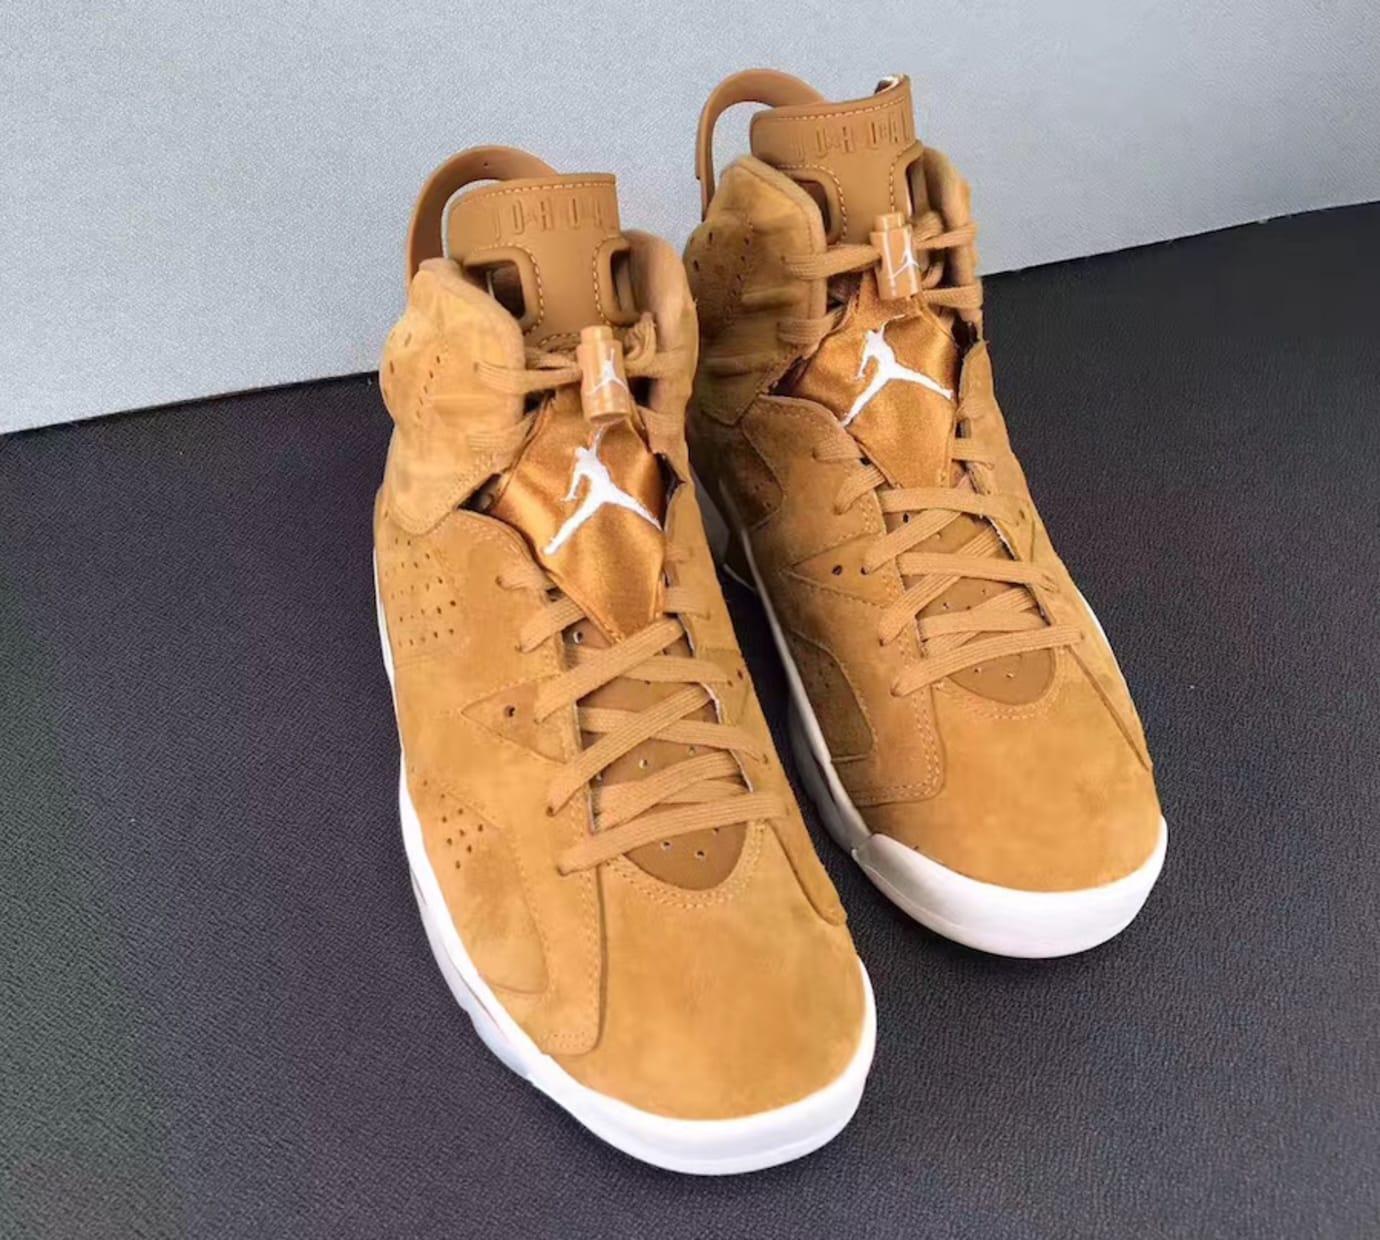 Air Jordan 6 Golden Harvest Release Date 384664-705 (3)